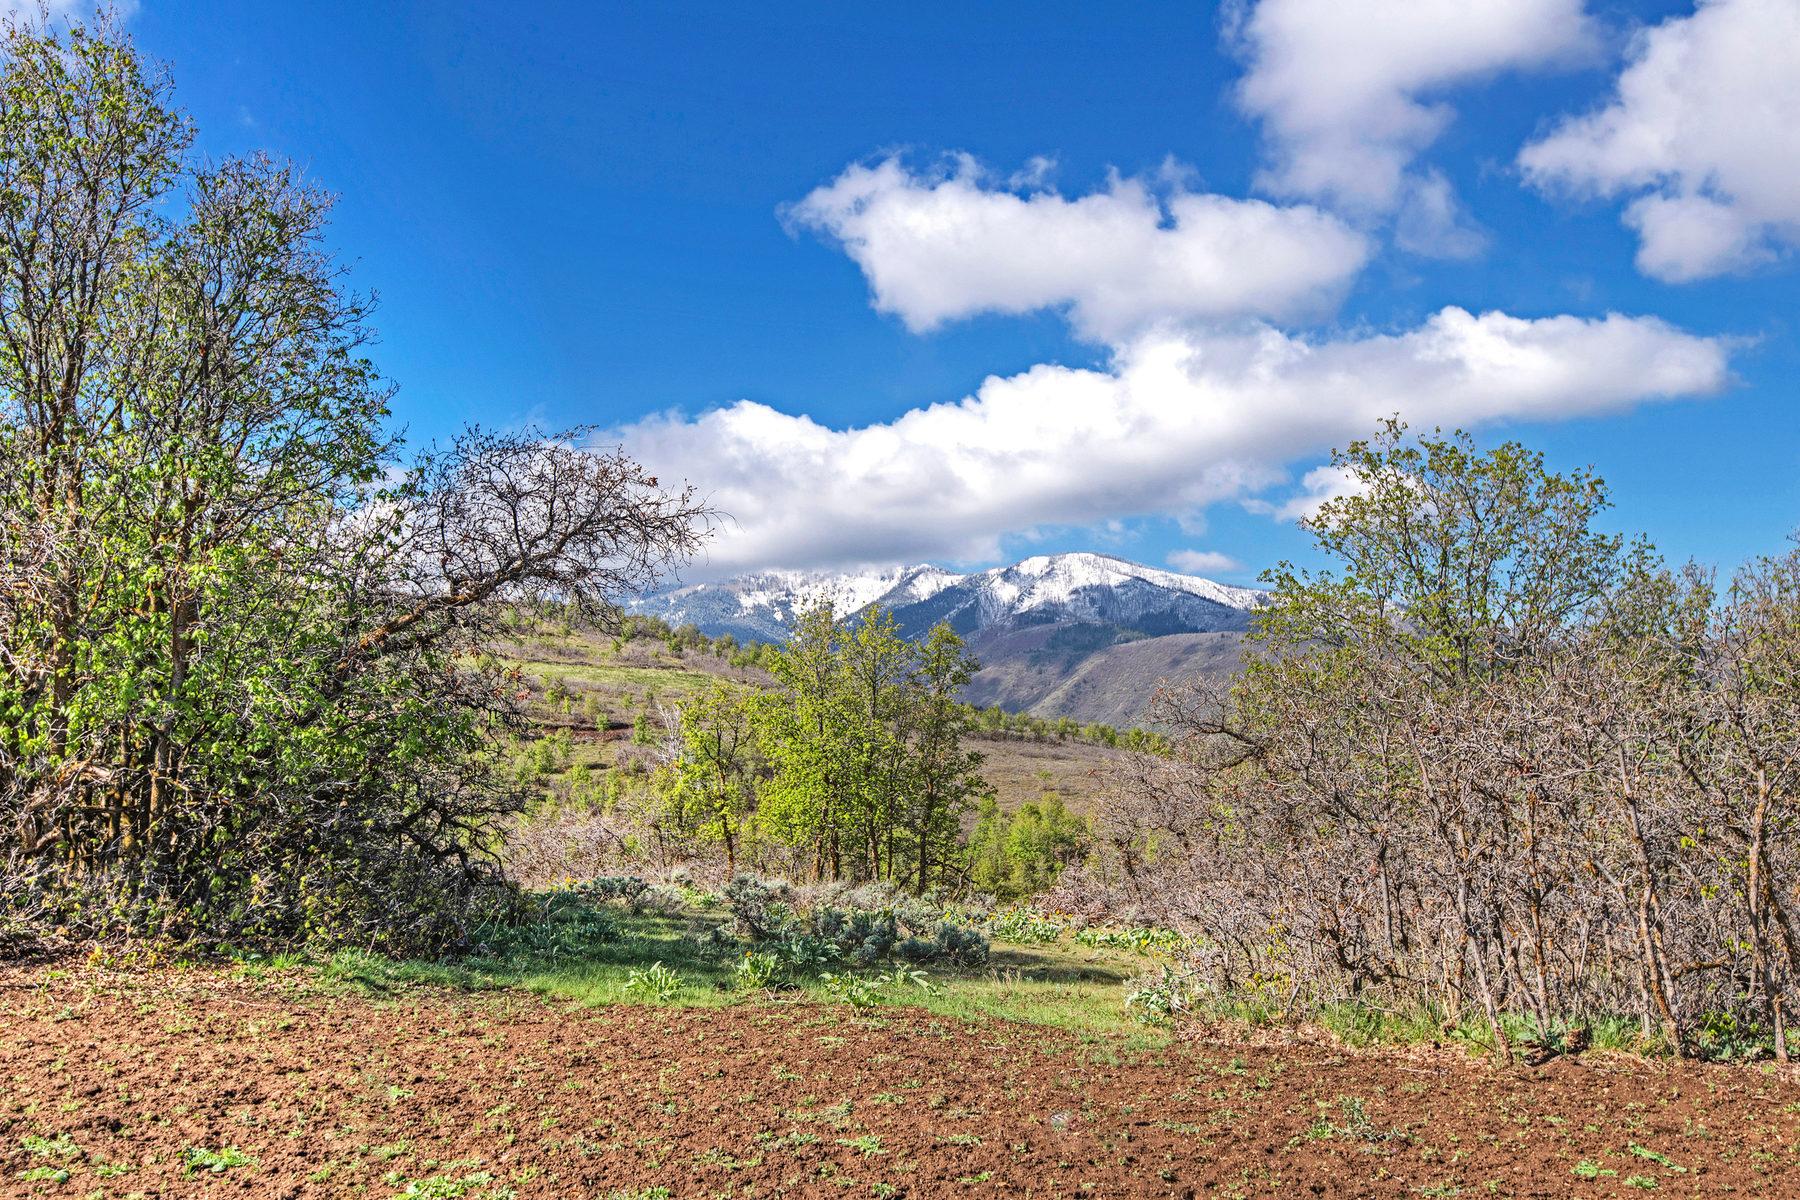 Terreno per Vendita alle ore Prime Lot in Summit Creek 748 S Summit Creek Dr Lot 20 Woodland Hills, Utah, 84653 Stati Uniti